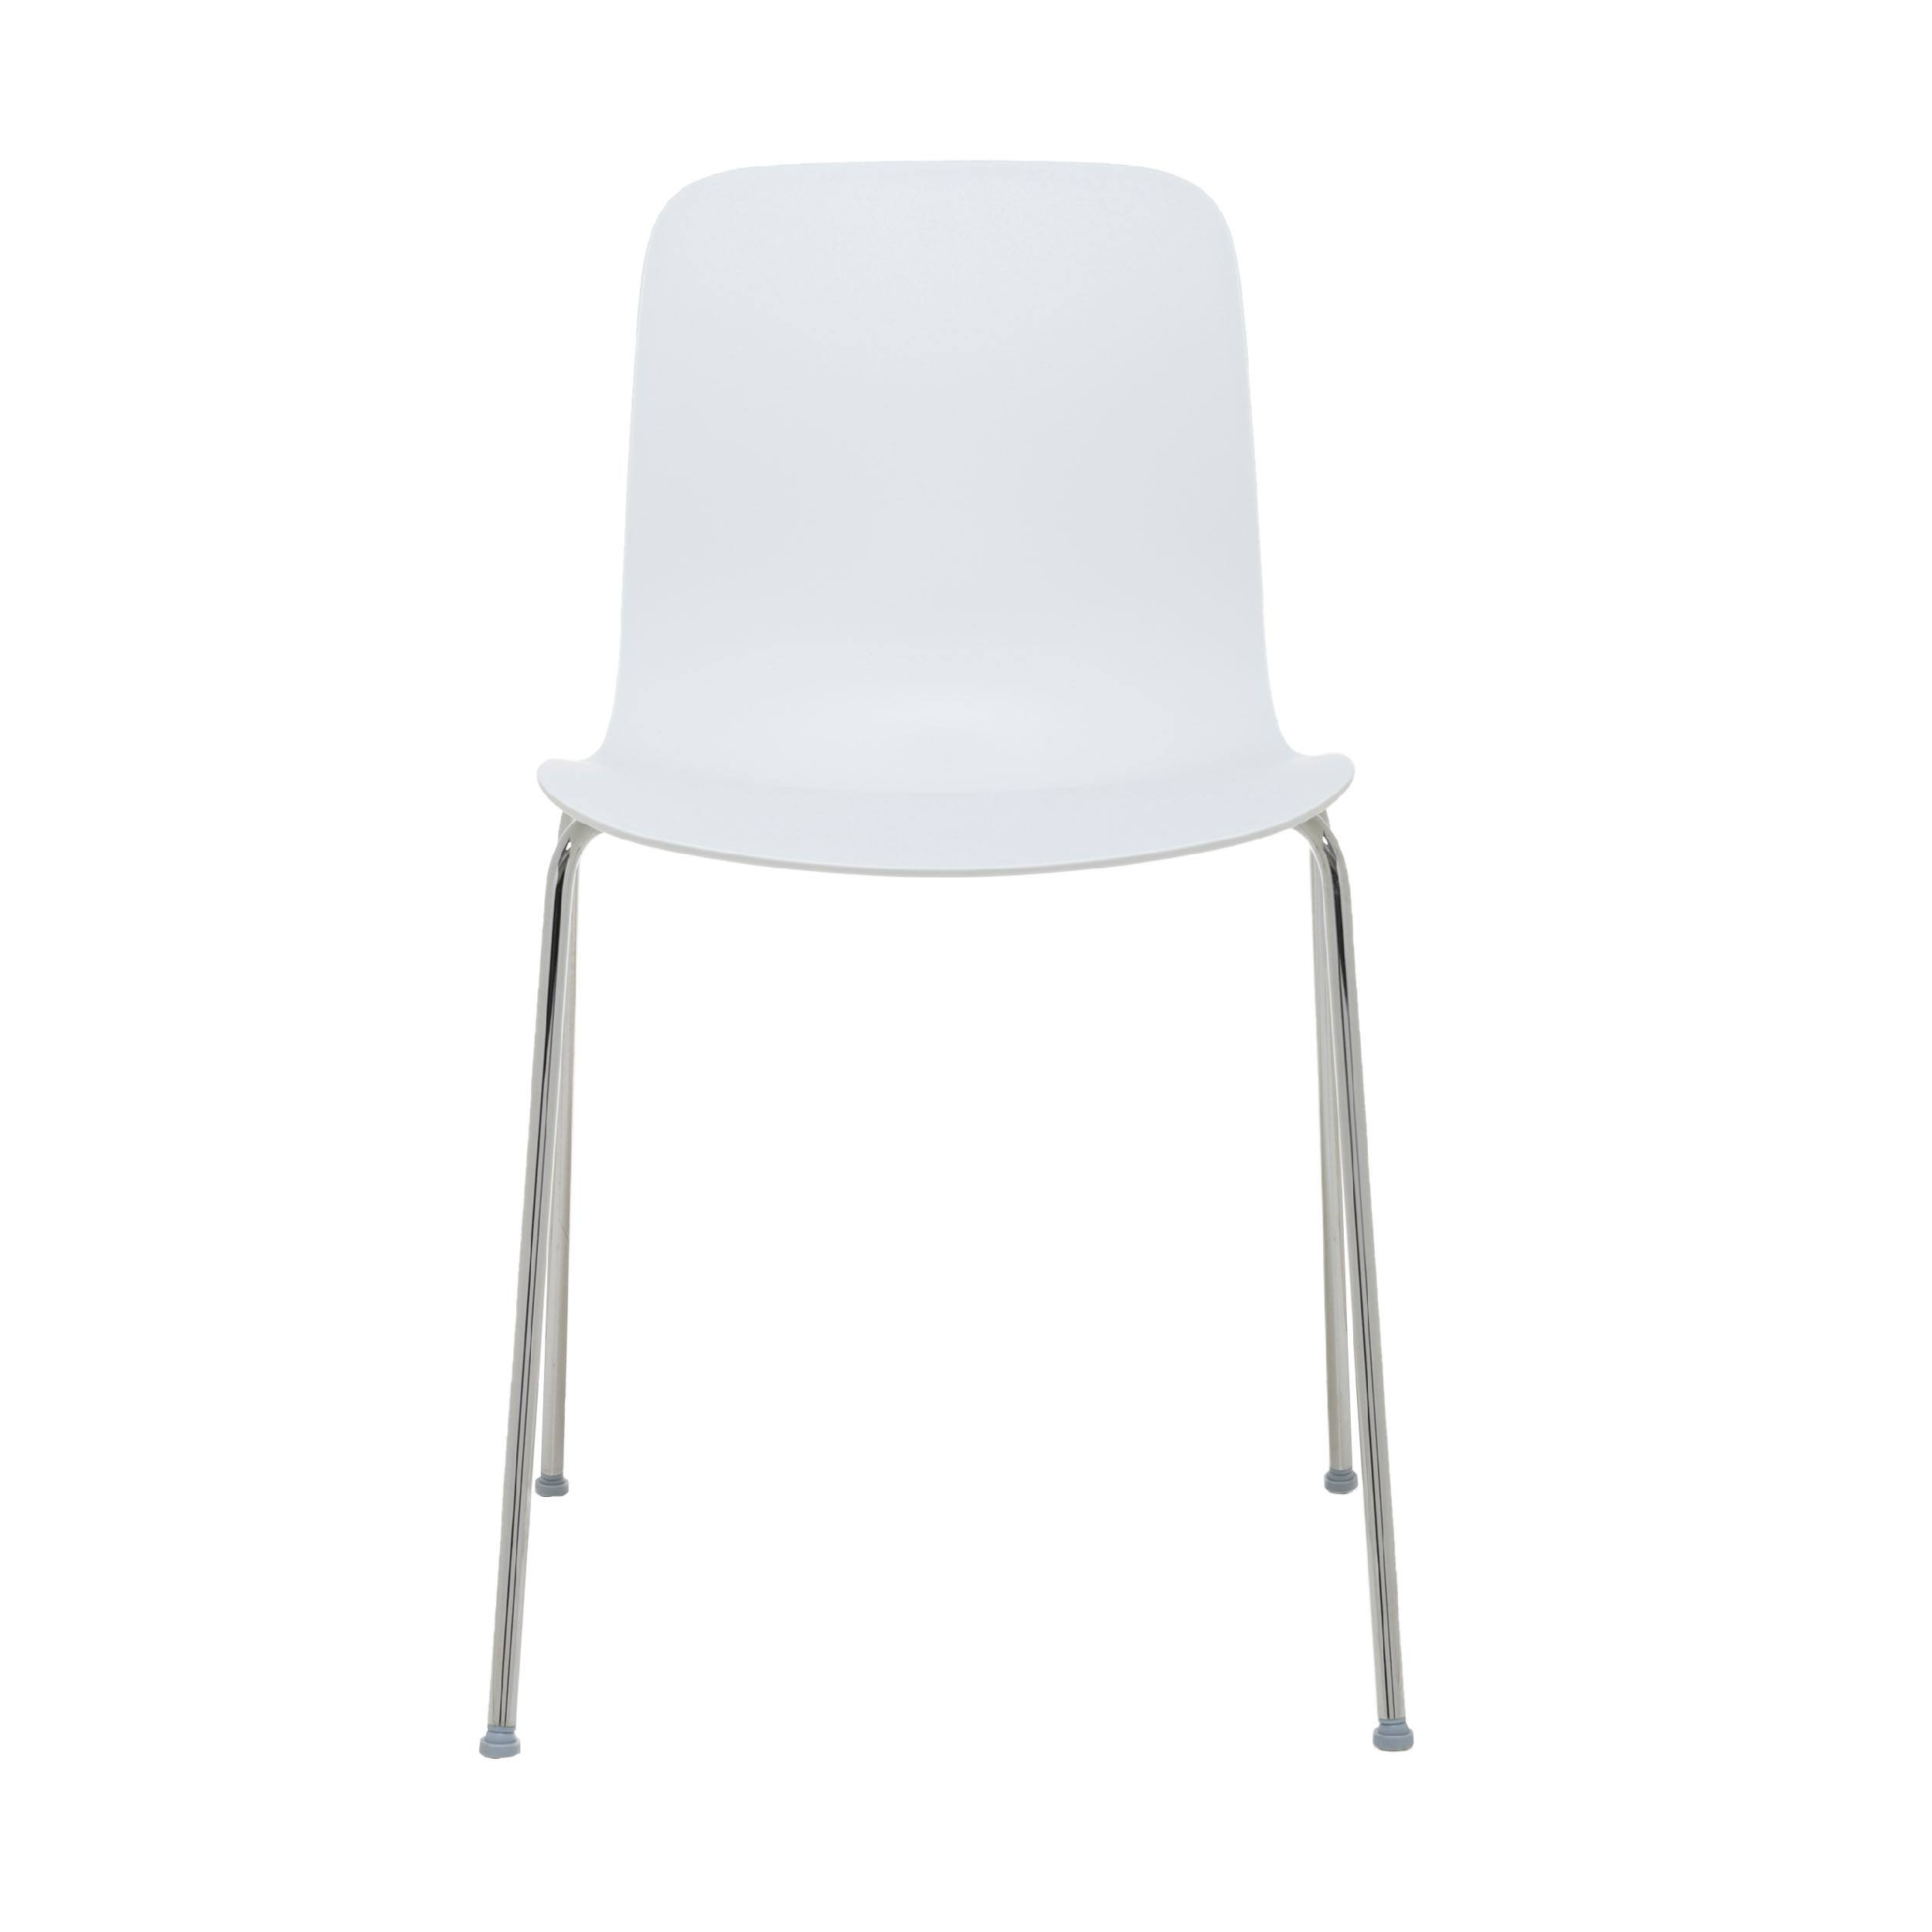 Substance Stuhl mit Stahlgestell